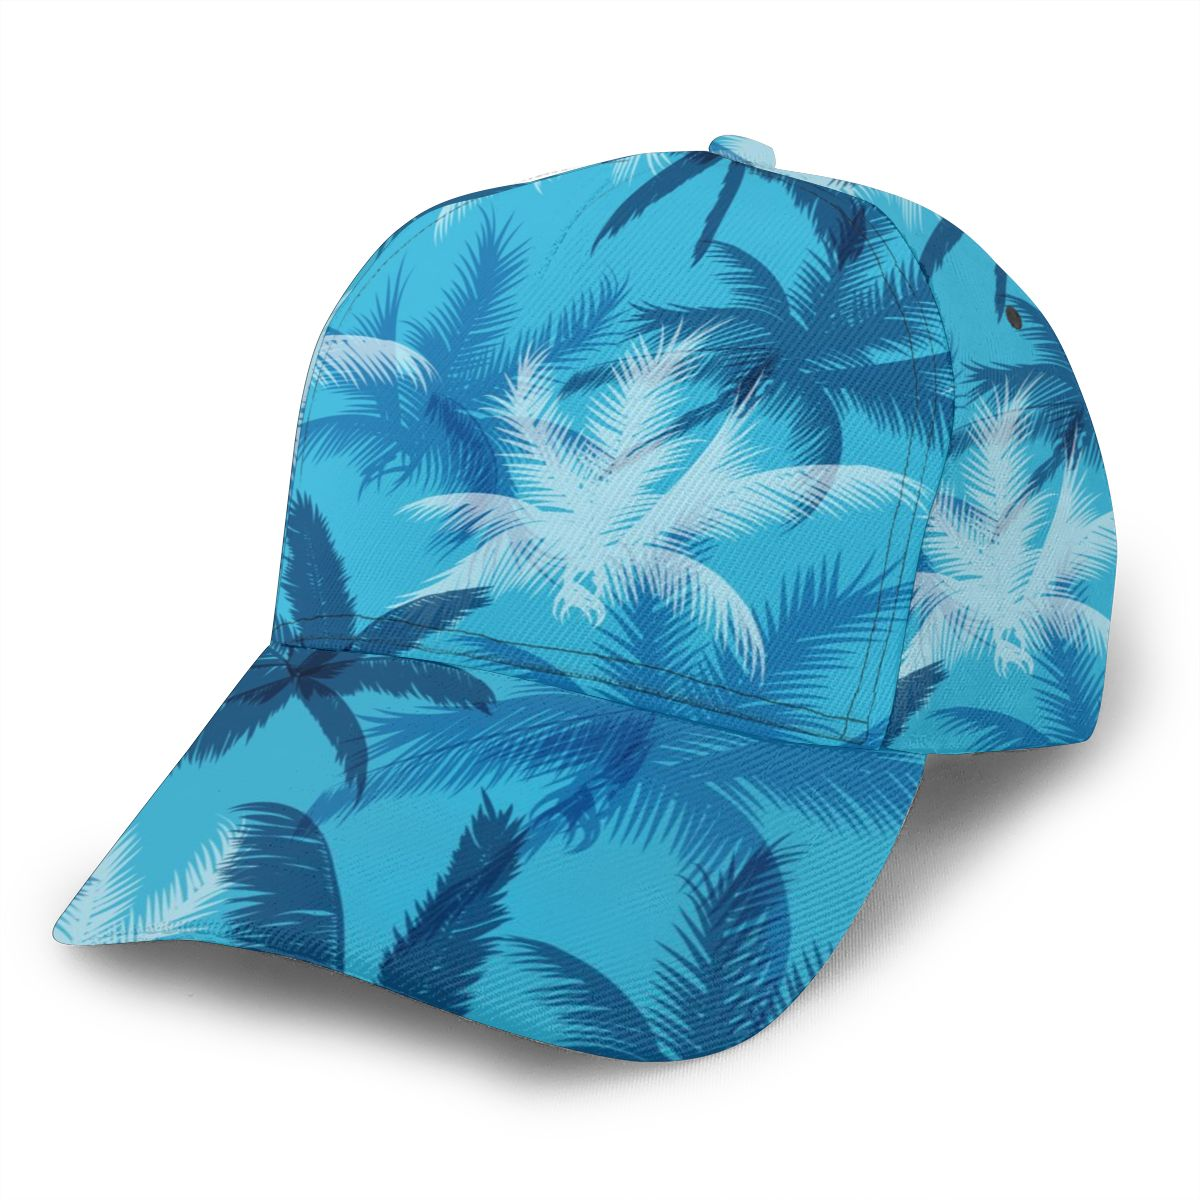 Tropical Palm Leaves Blue Baseball Cap women men snapback caps Classic Style hat Casual Sport Outdoor cap